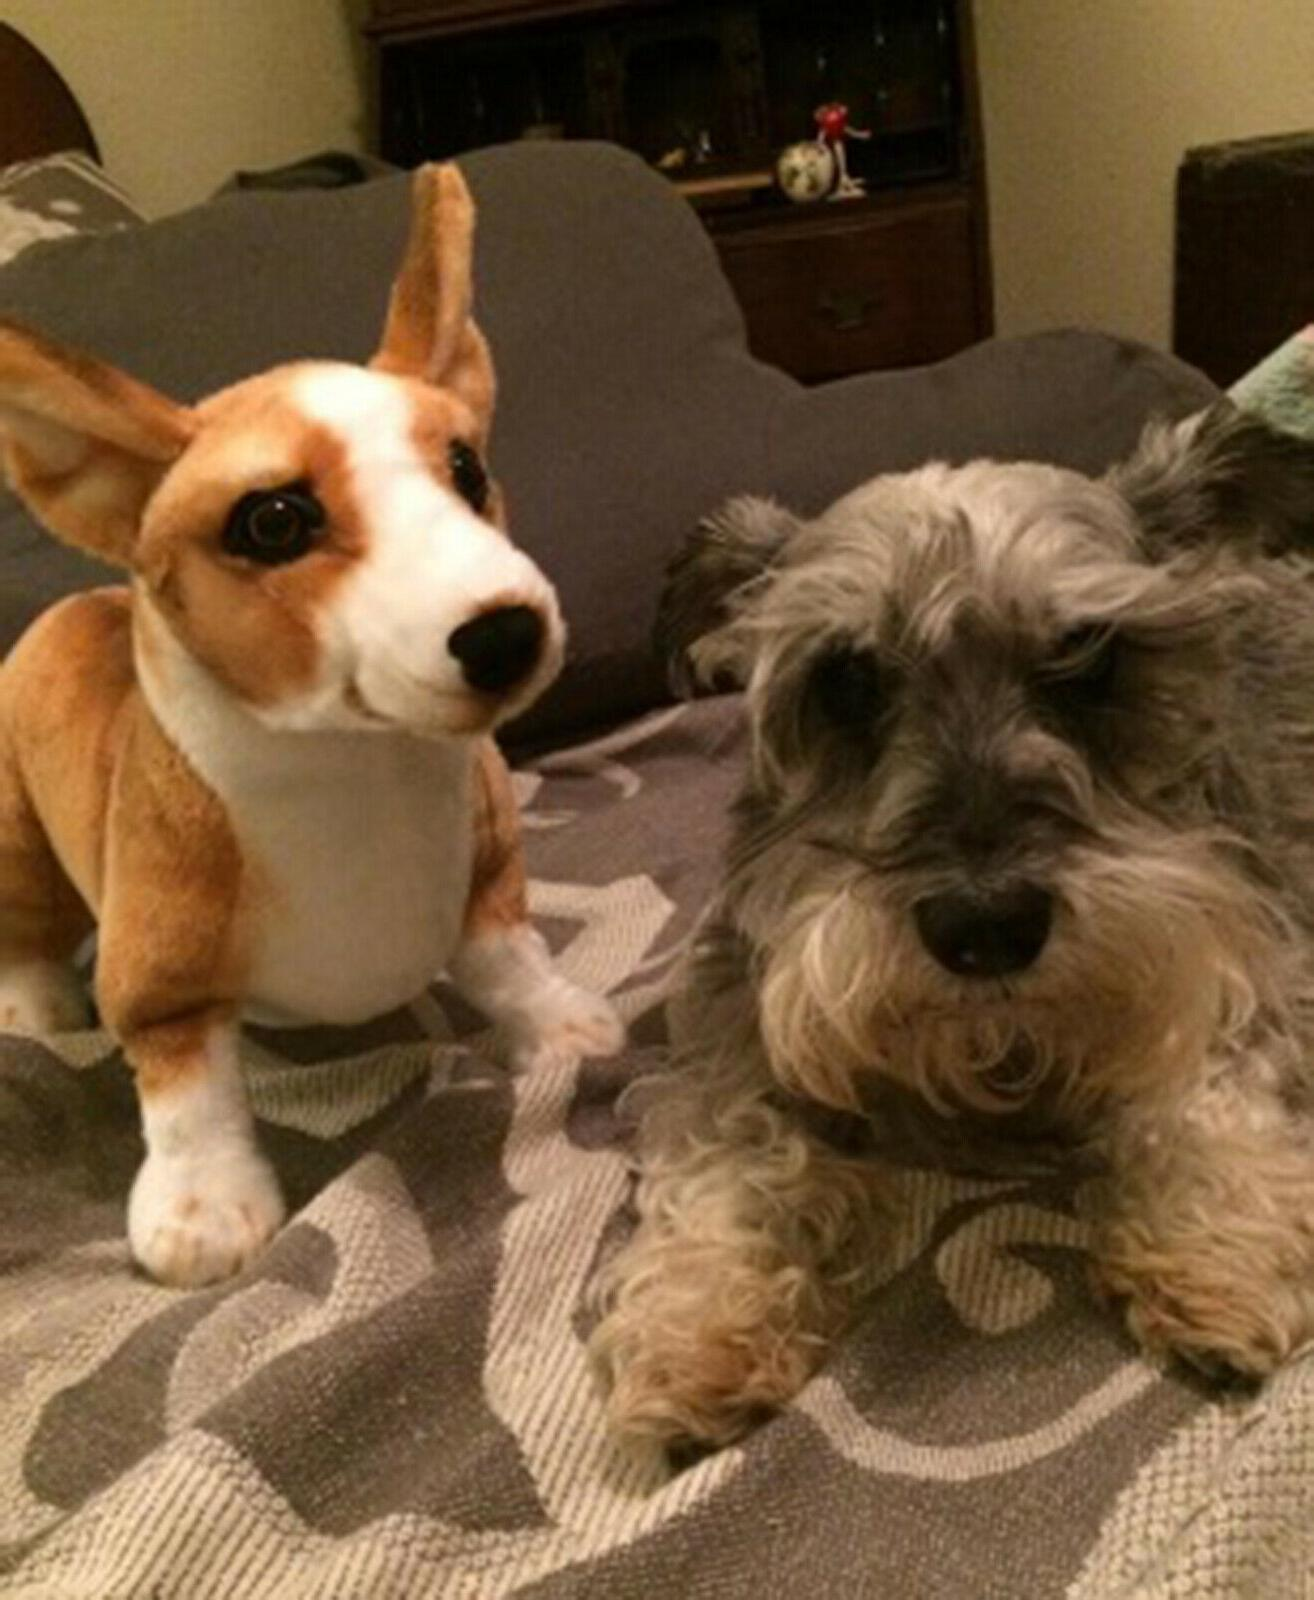 Realistic Dog Plush, Kids Stuffed Animal Toy Gift